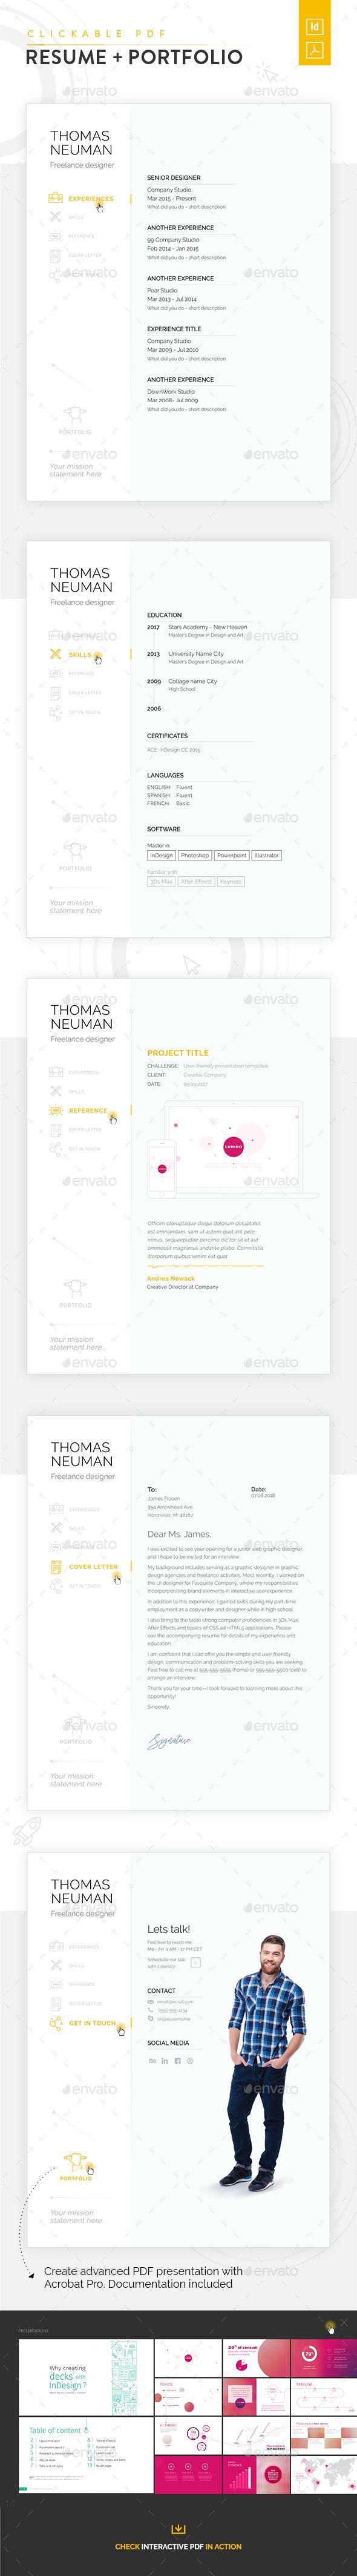 Clickable Resume with Portfolio Presentation